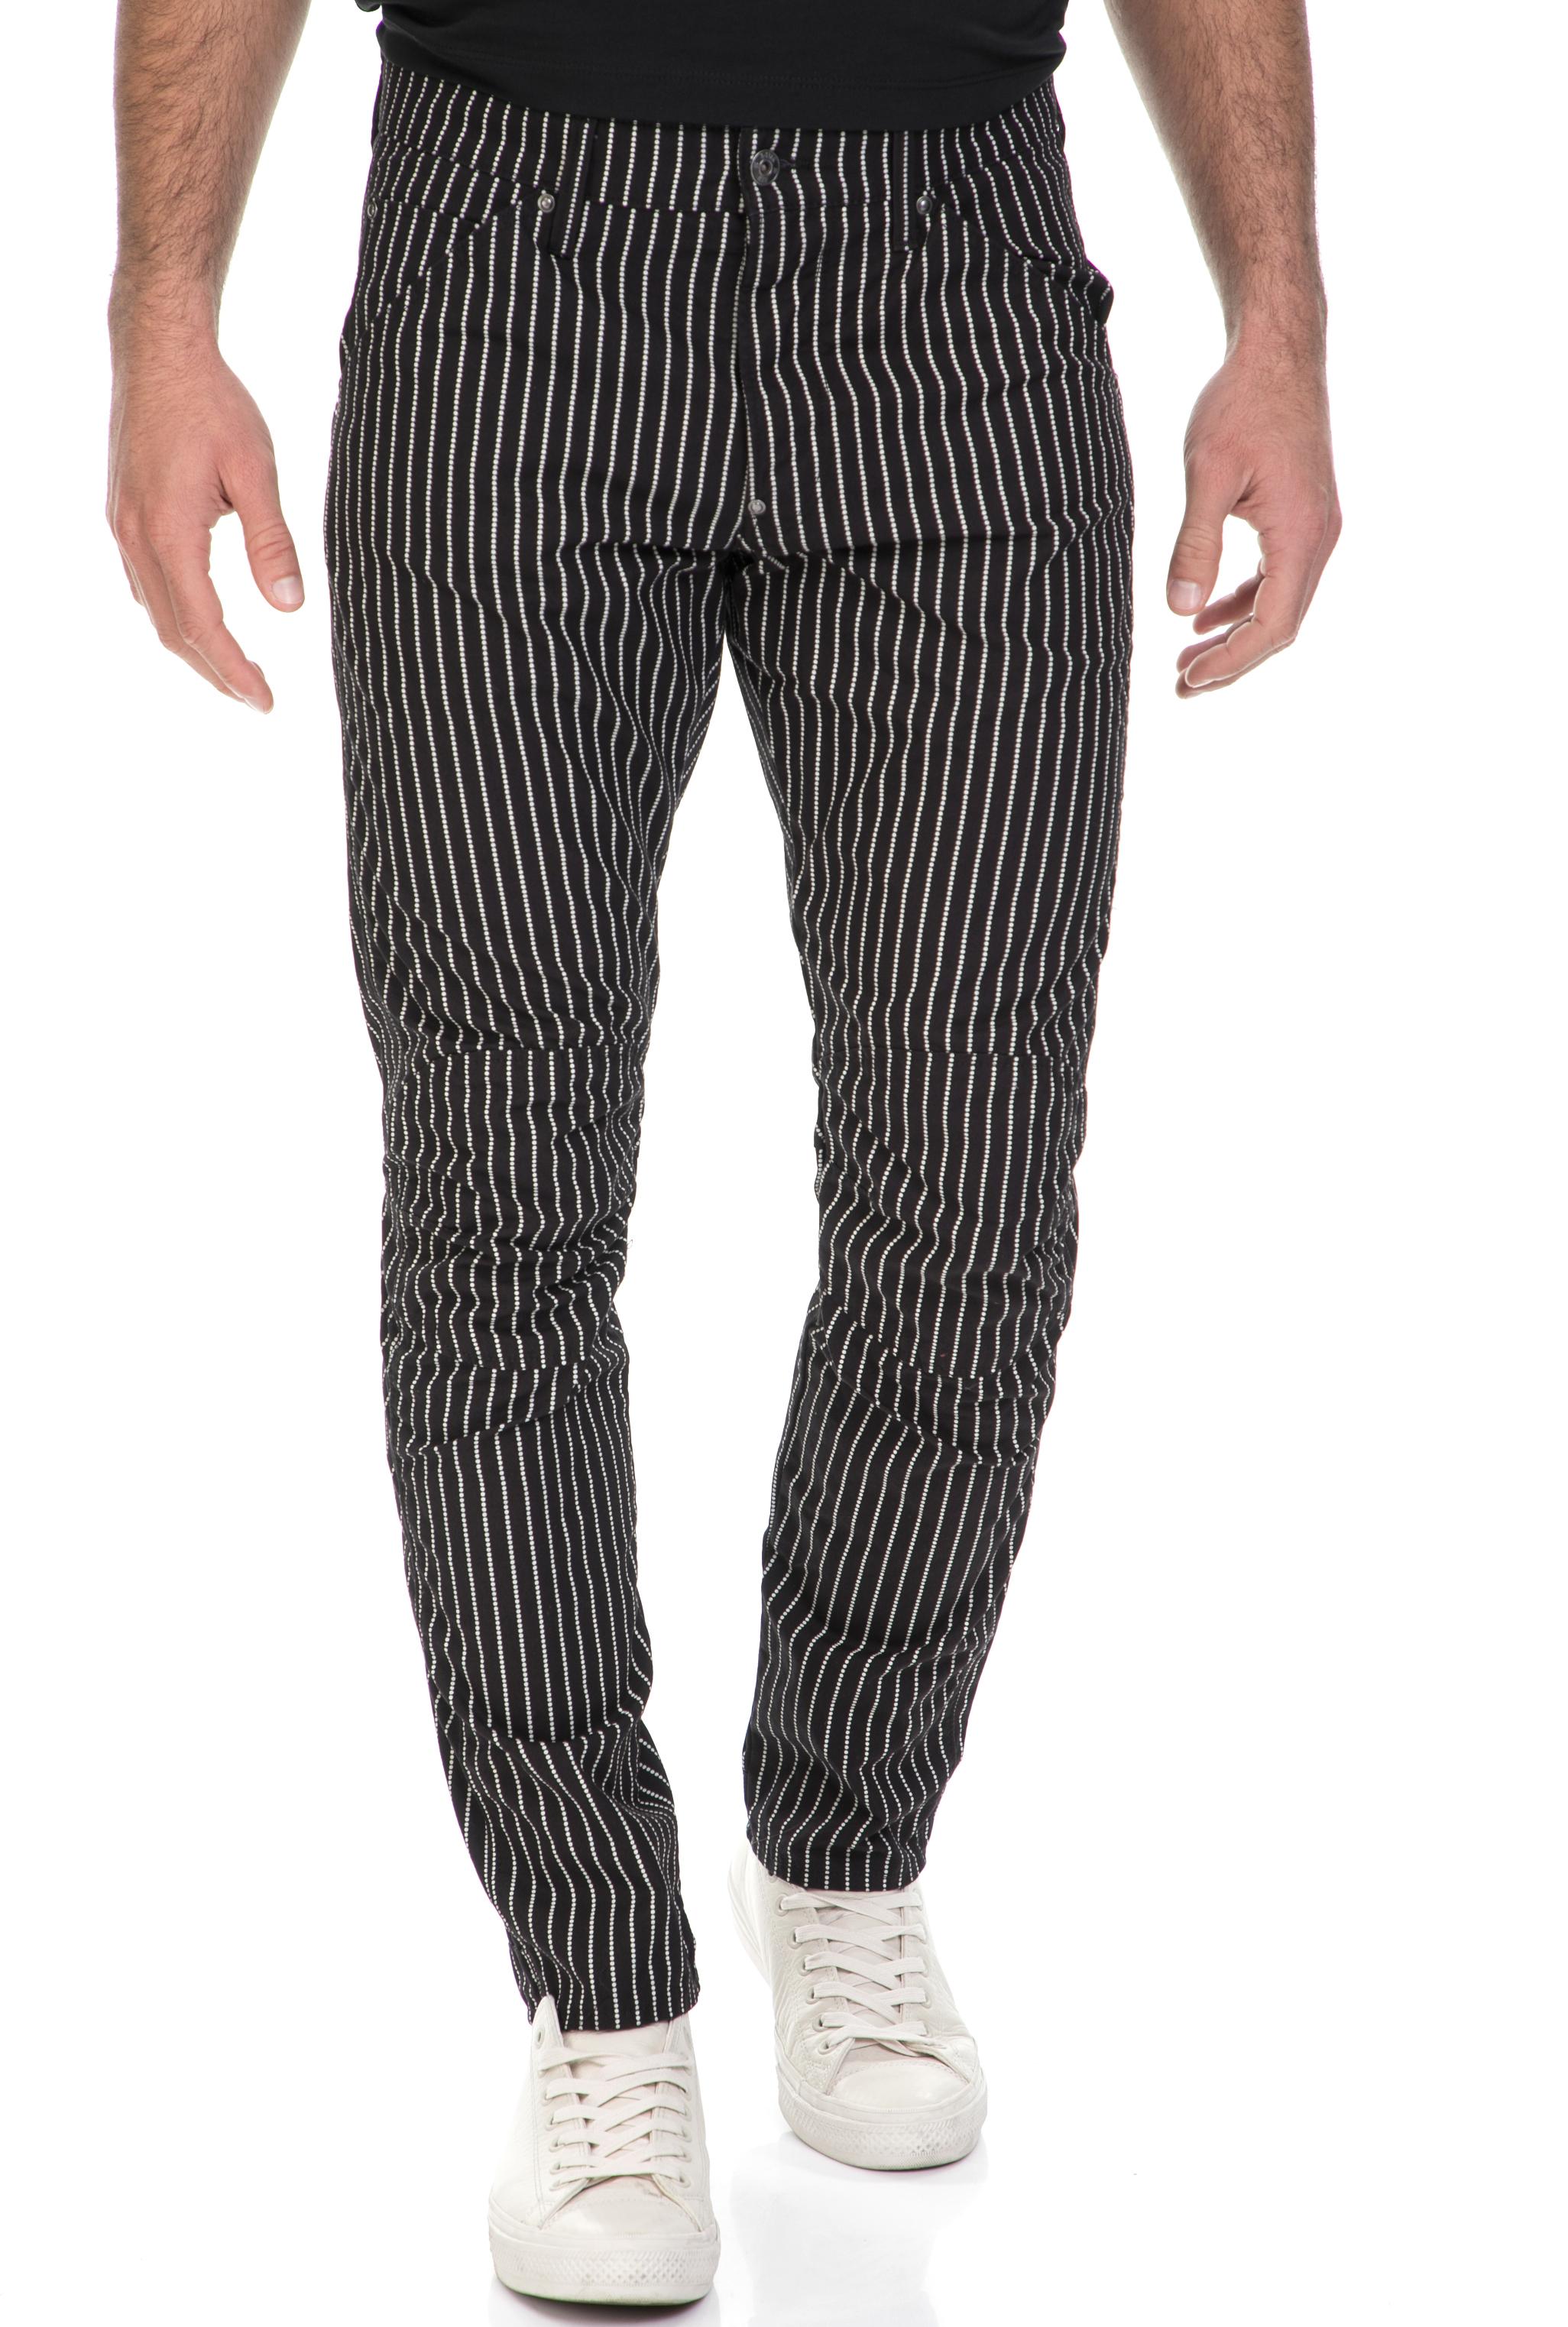 G-STAR - Ανδρικό παντελόνι 3D Tapered COJ G-STAR μαύρο-λευκό ανδρικά ρούχα παντελόνια chinos